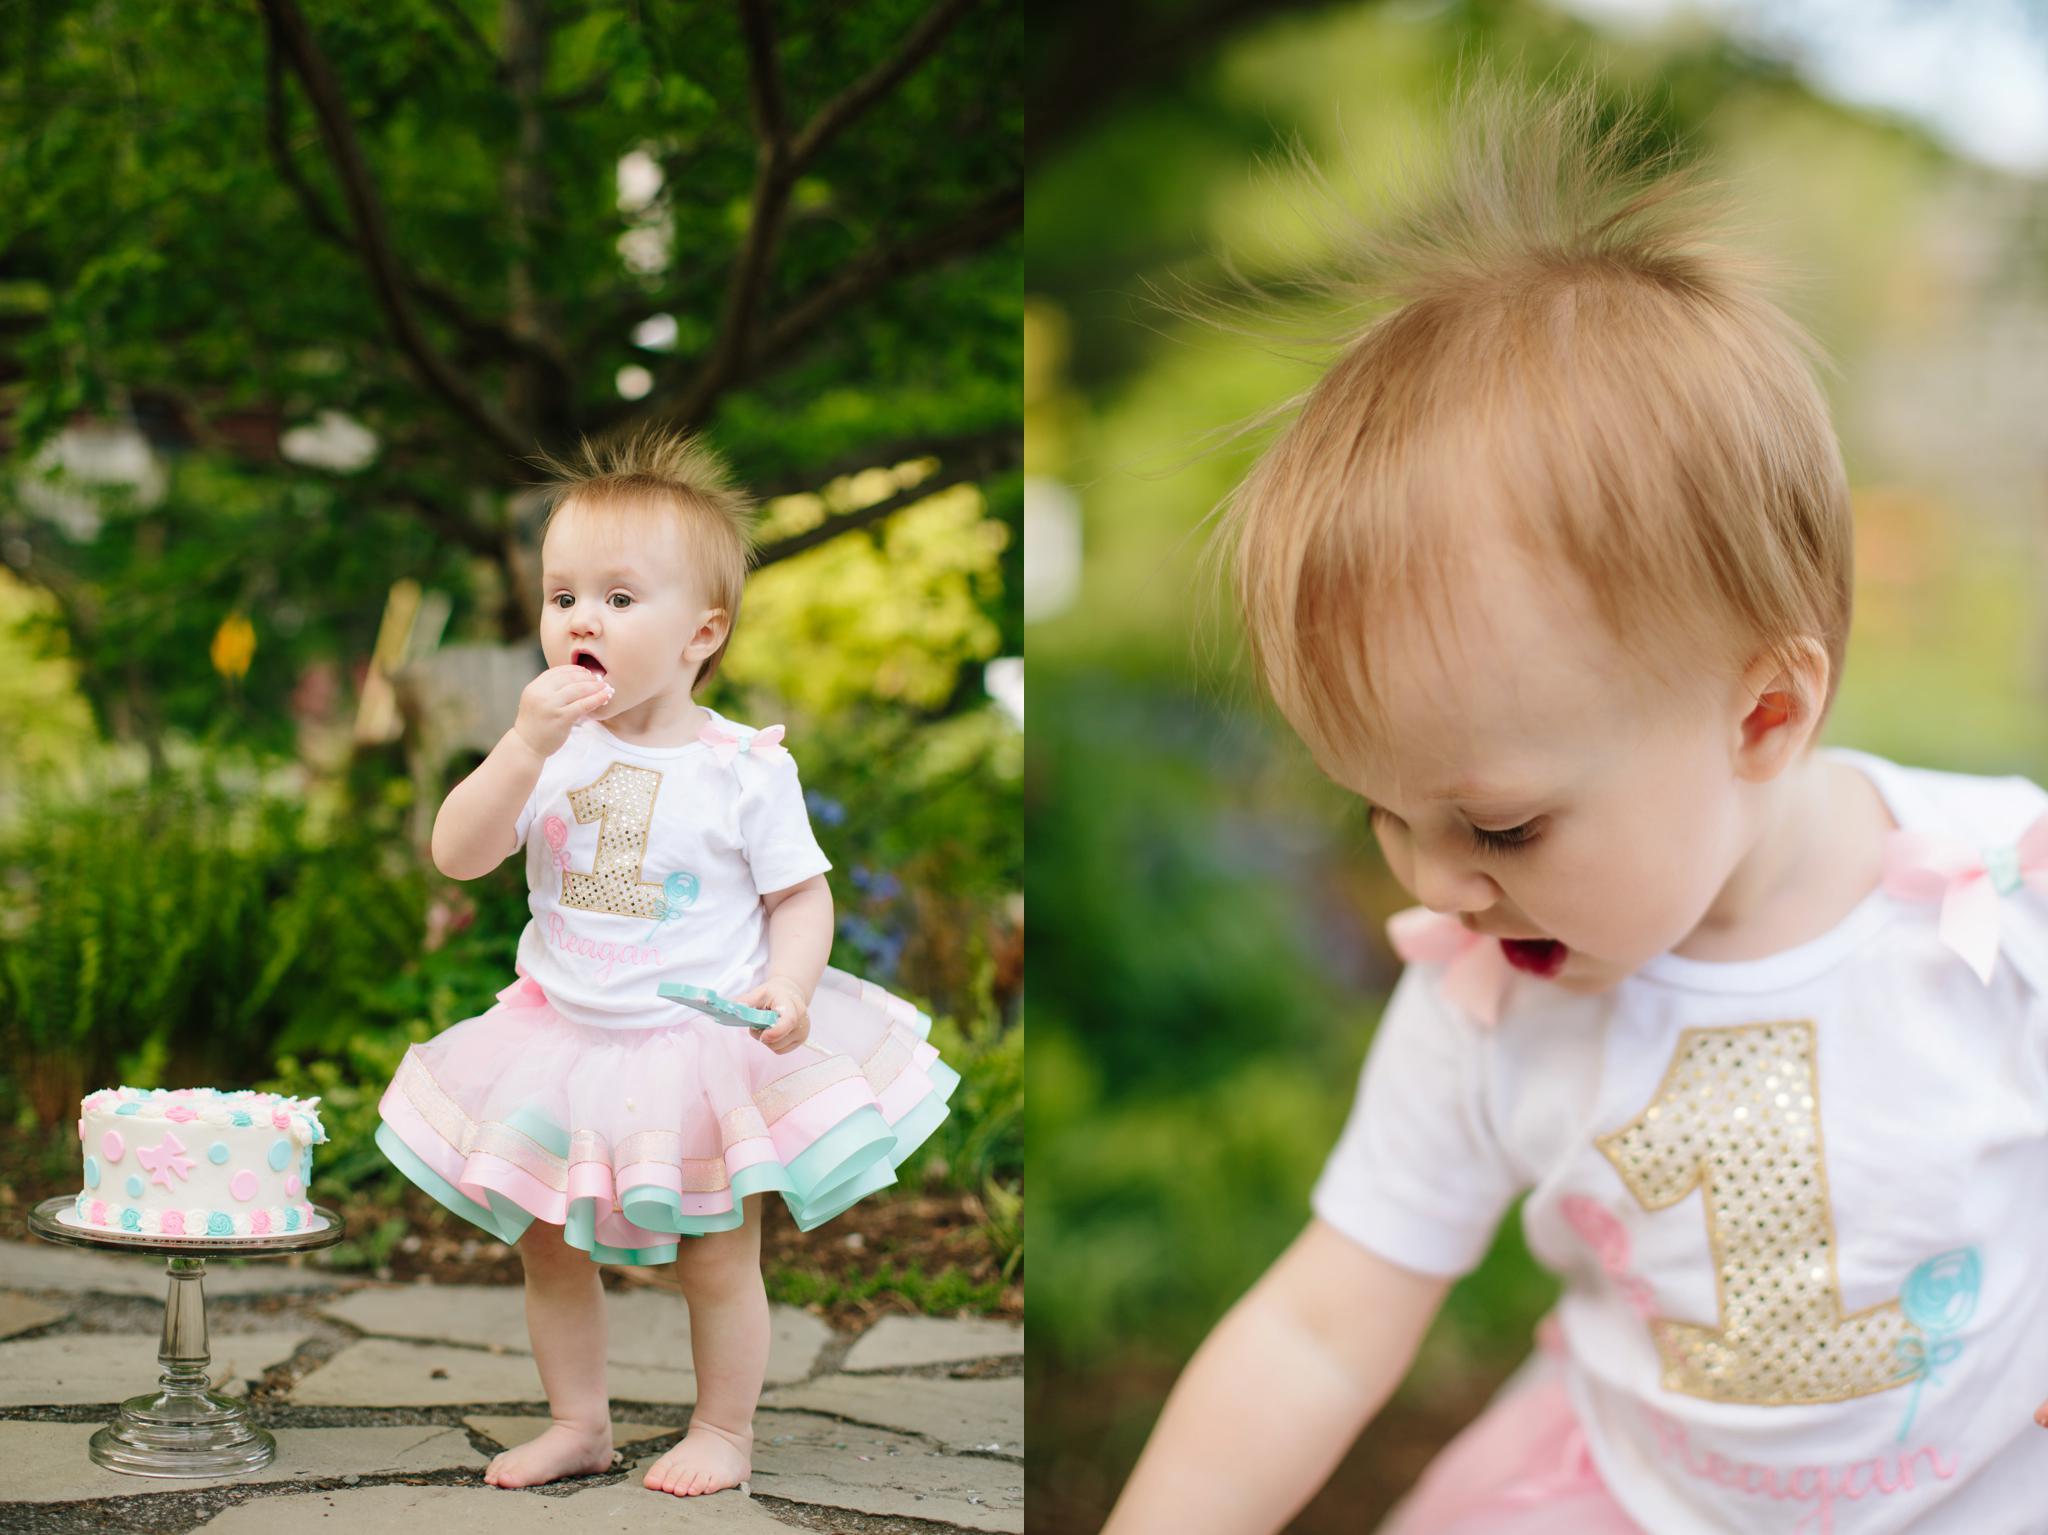 creekside_gardens_baby_portraits_0360.jpg